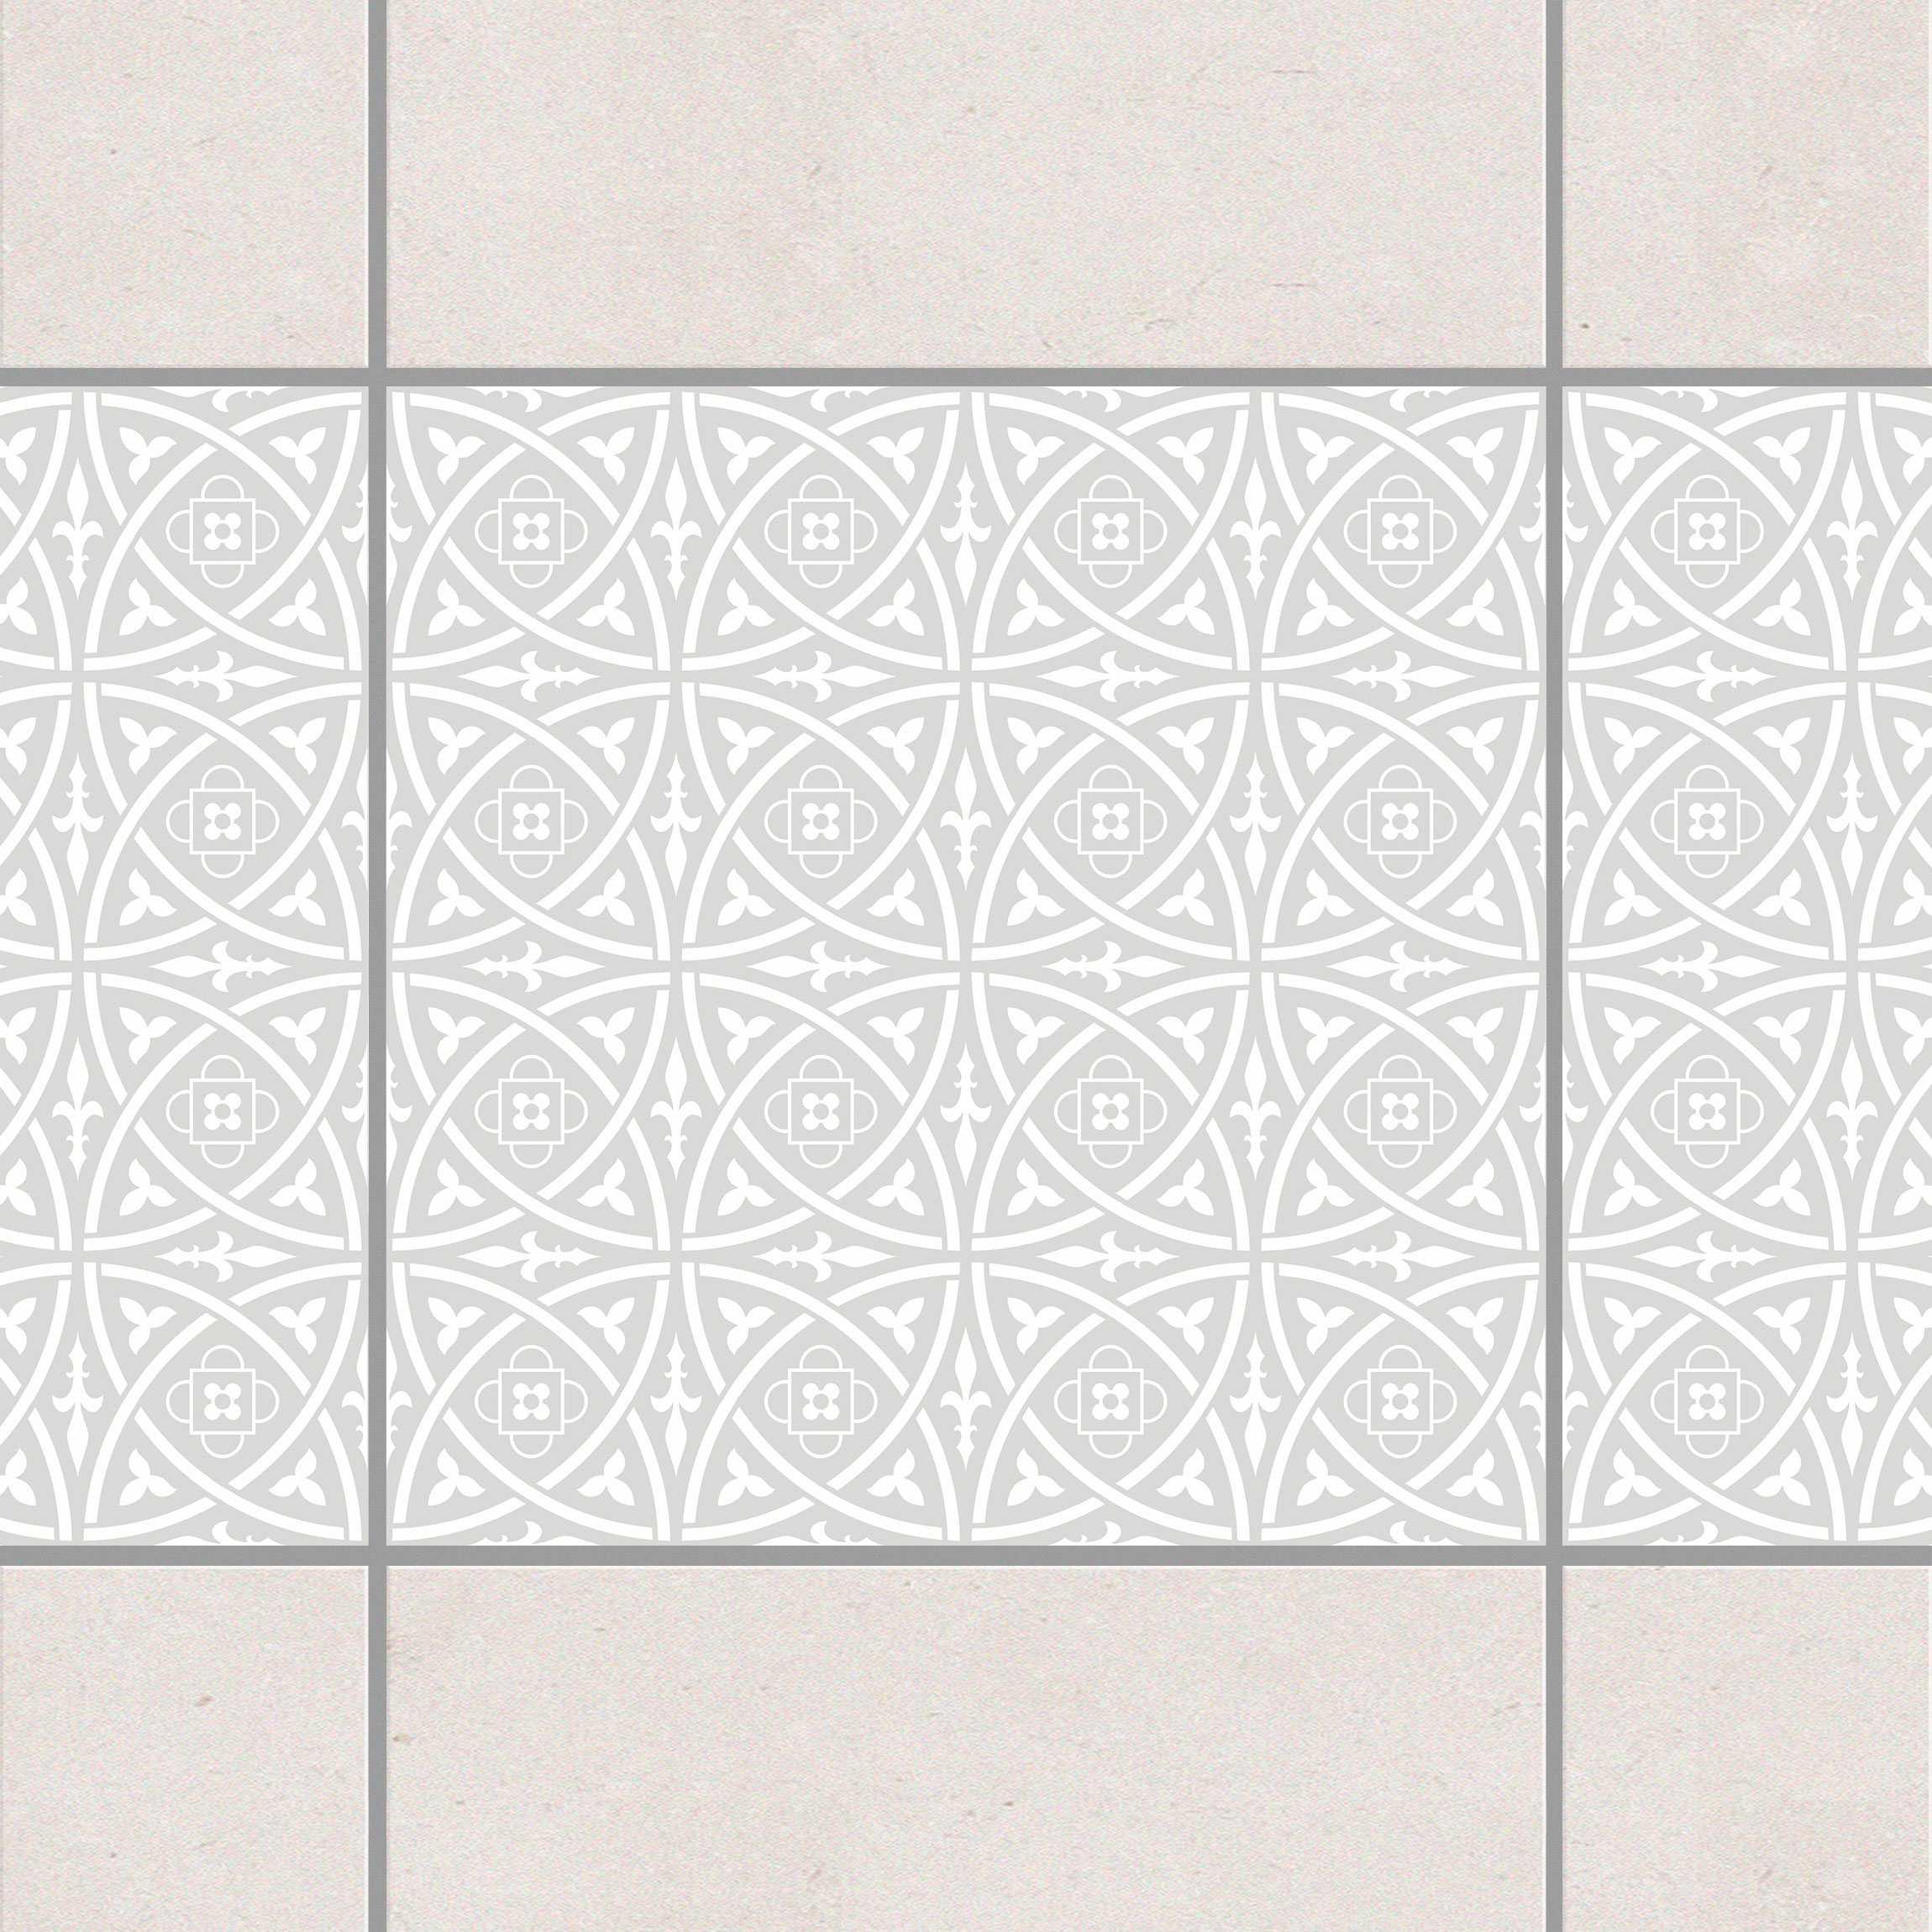 fliesen bord re keltisch light grey 10x10 cm fliesenaufkleber grau. Black Bedroom Furniture Sets. Home Design Ideas